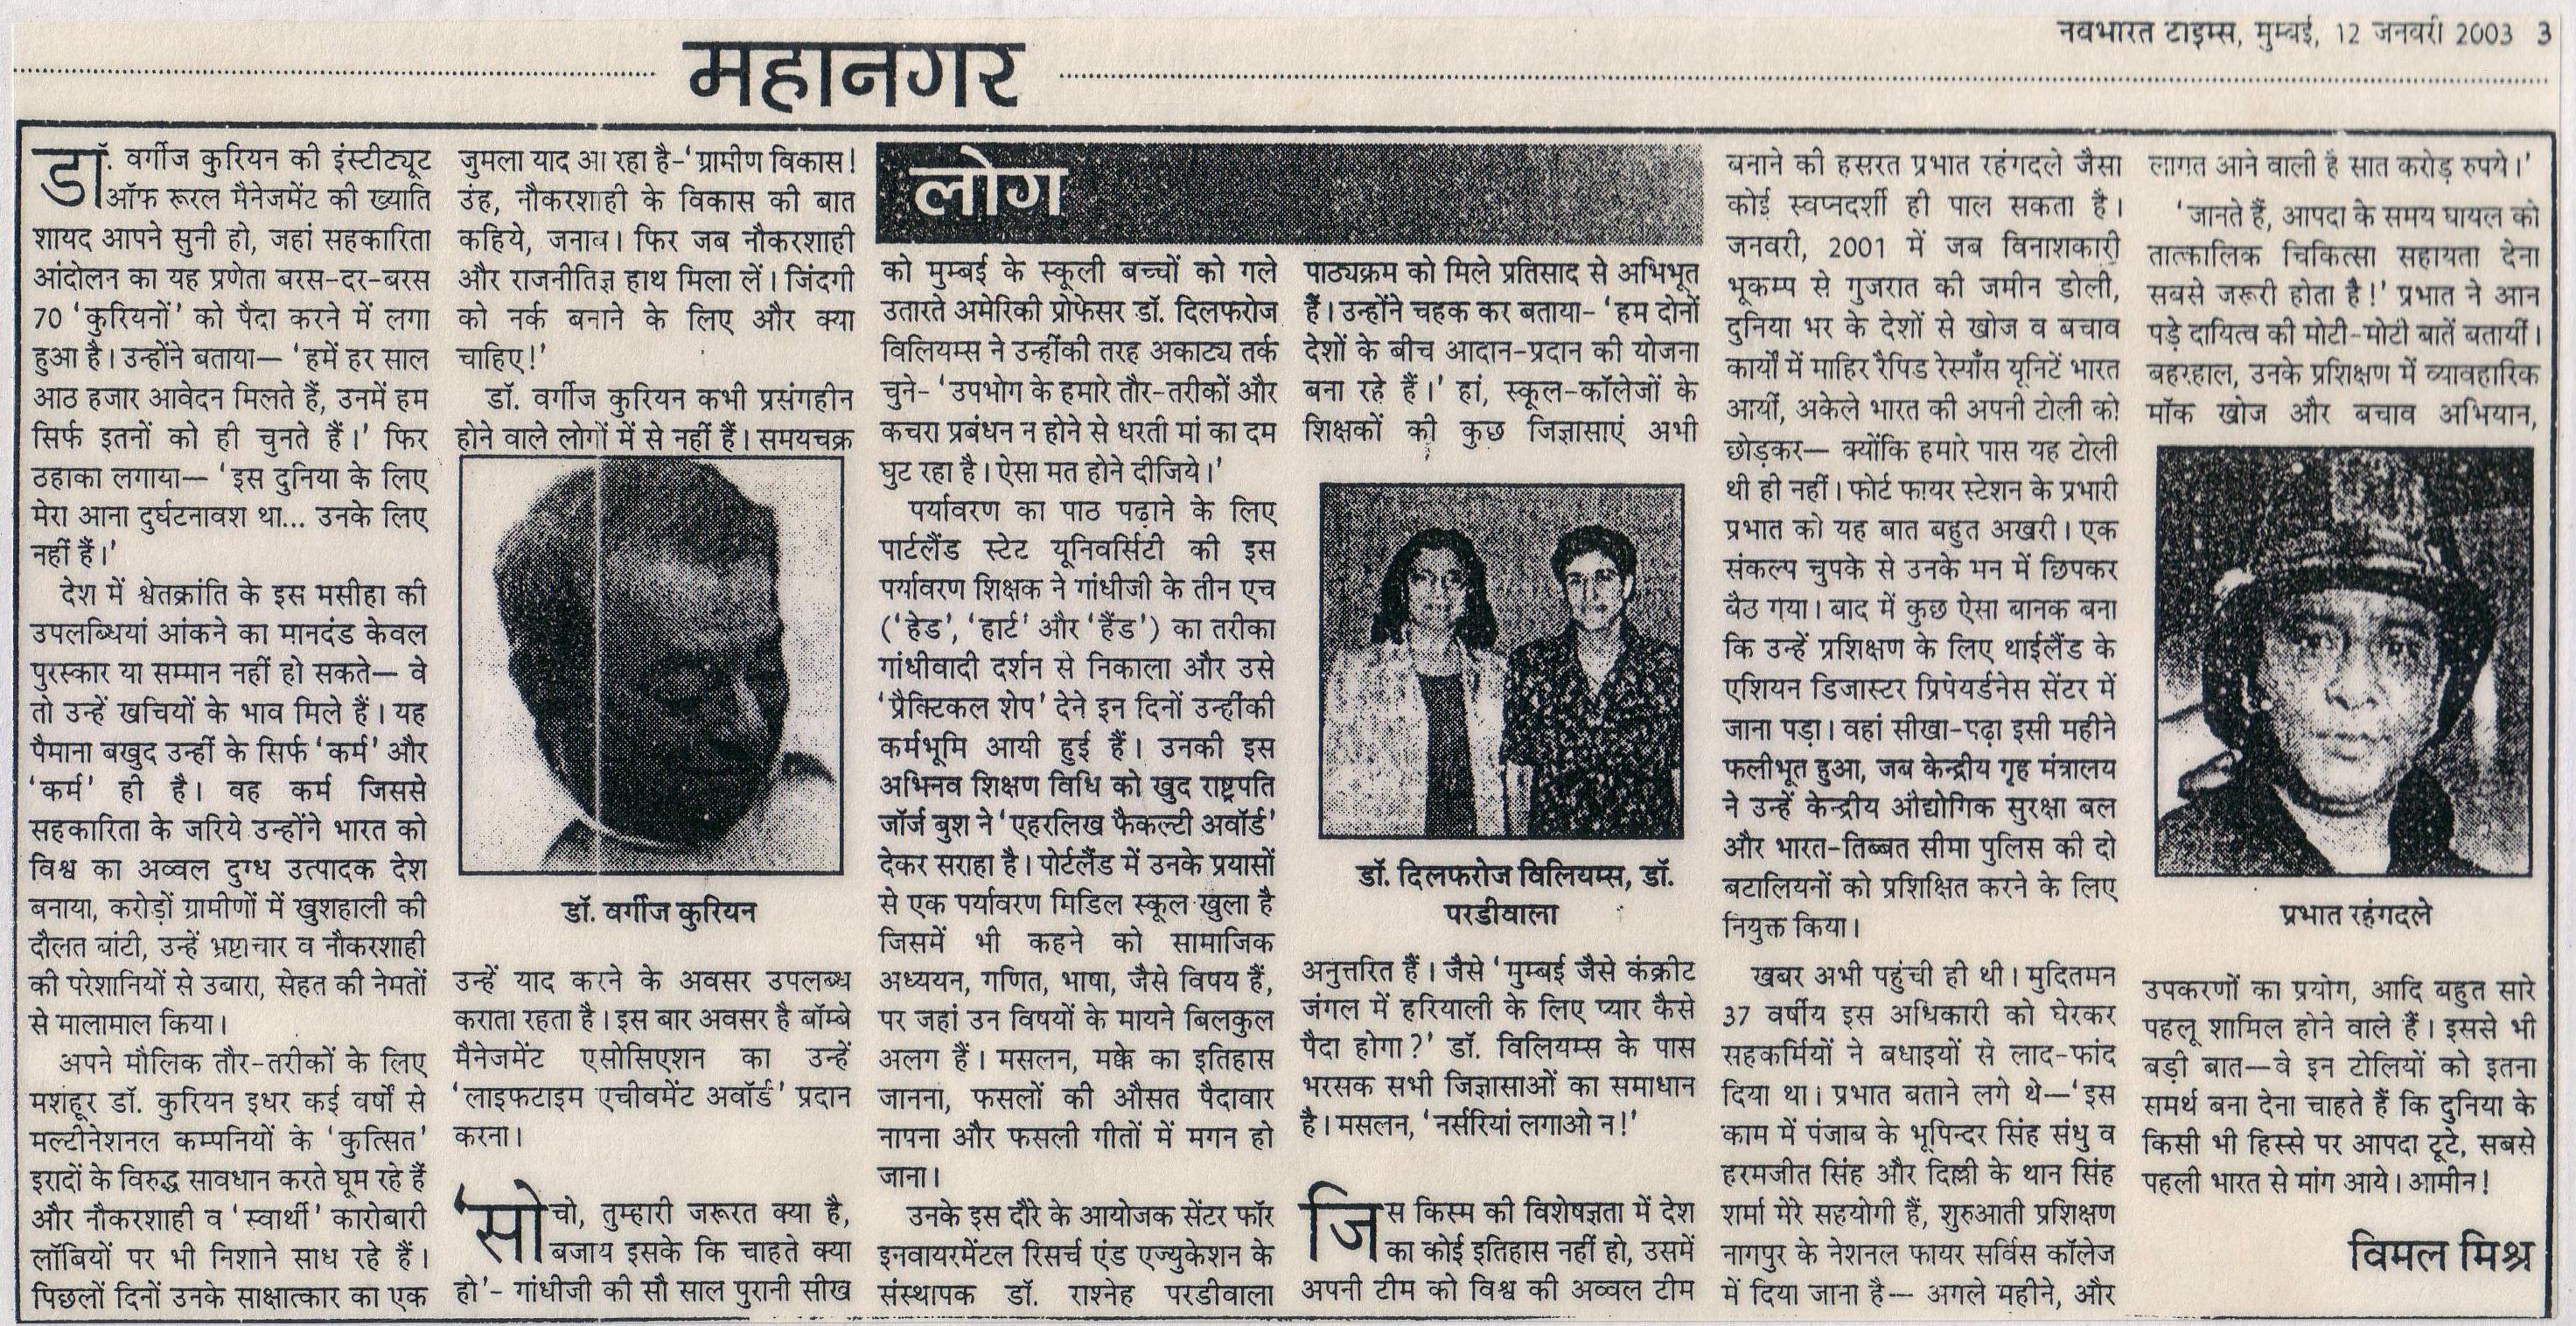 Navbharat Times - 12th January, 2003